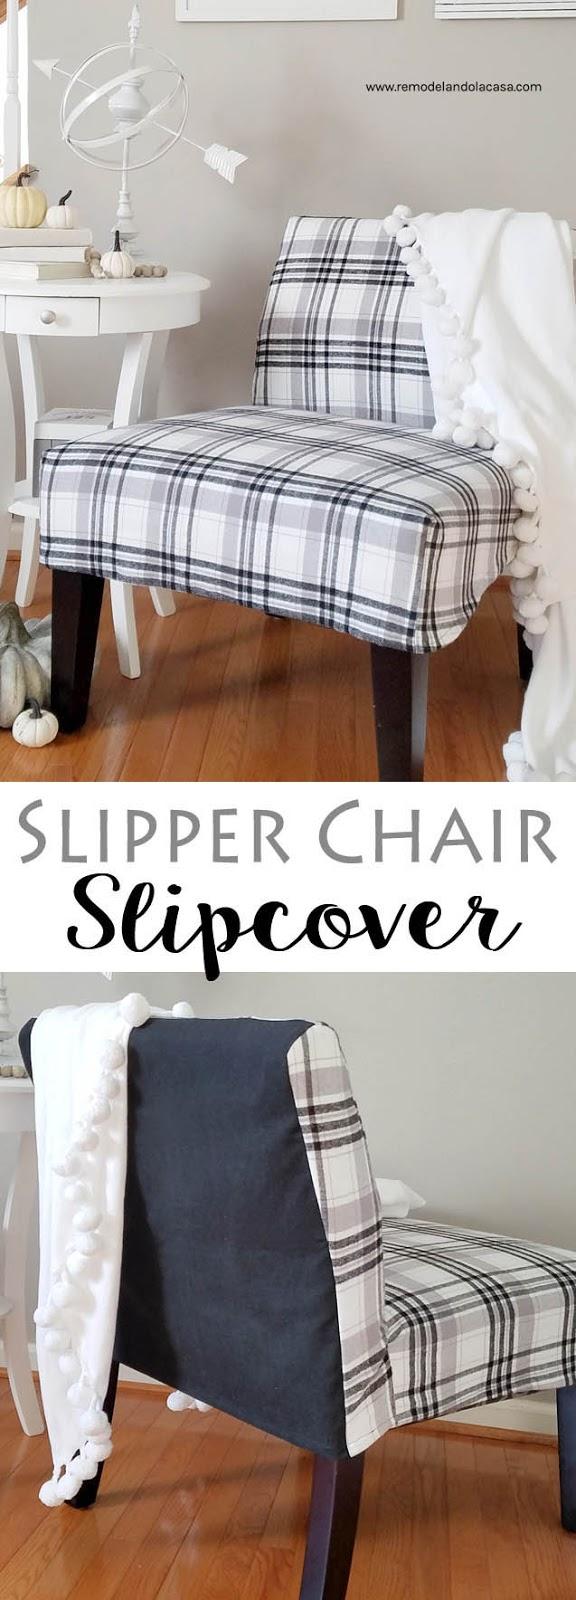 slipcover for armless slipper chair wagon wheel rocker slipcovers remodelando la casa how to sew a dual tone black and white plaid fabric oak